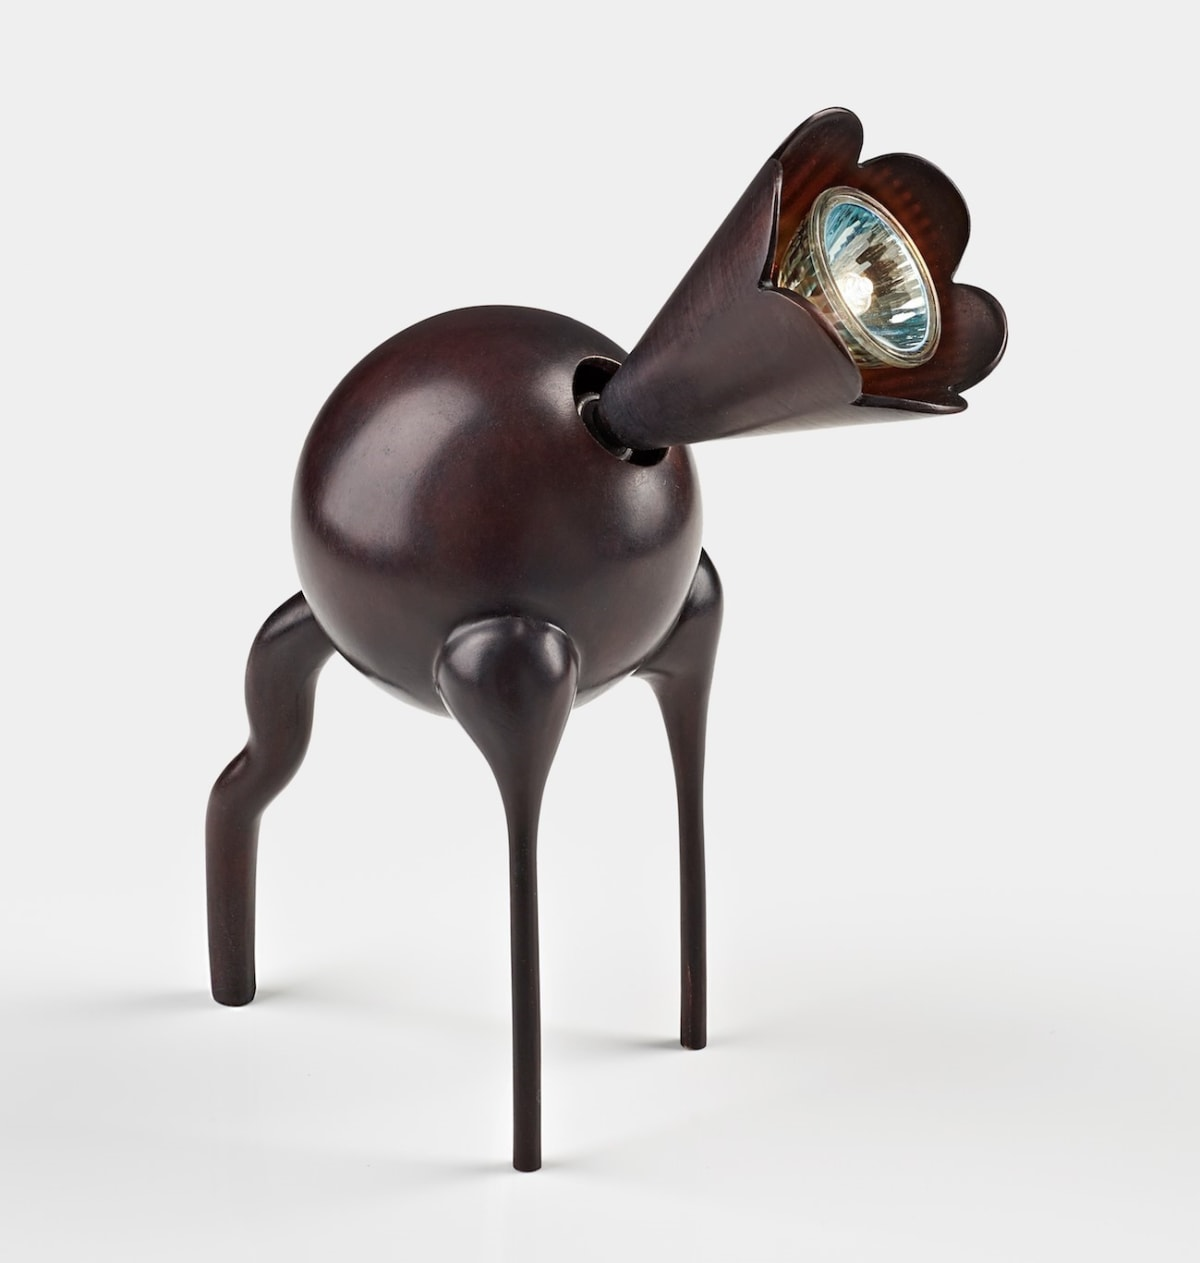 Hubert Le Gall, Odette Lamp (Noire / Chocolat), 2017